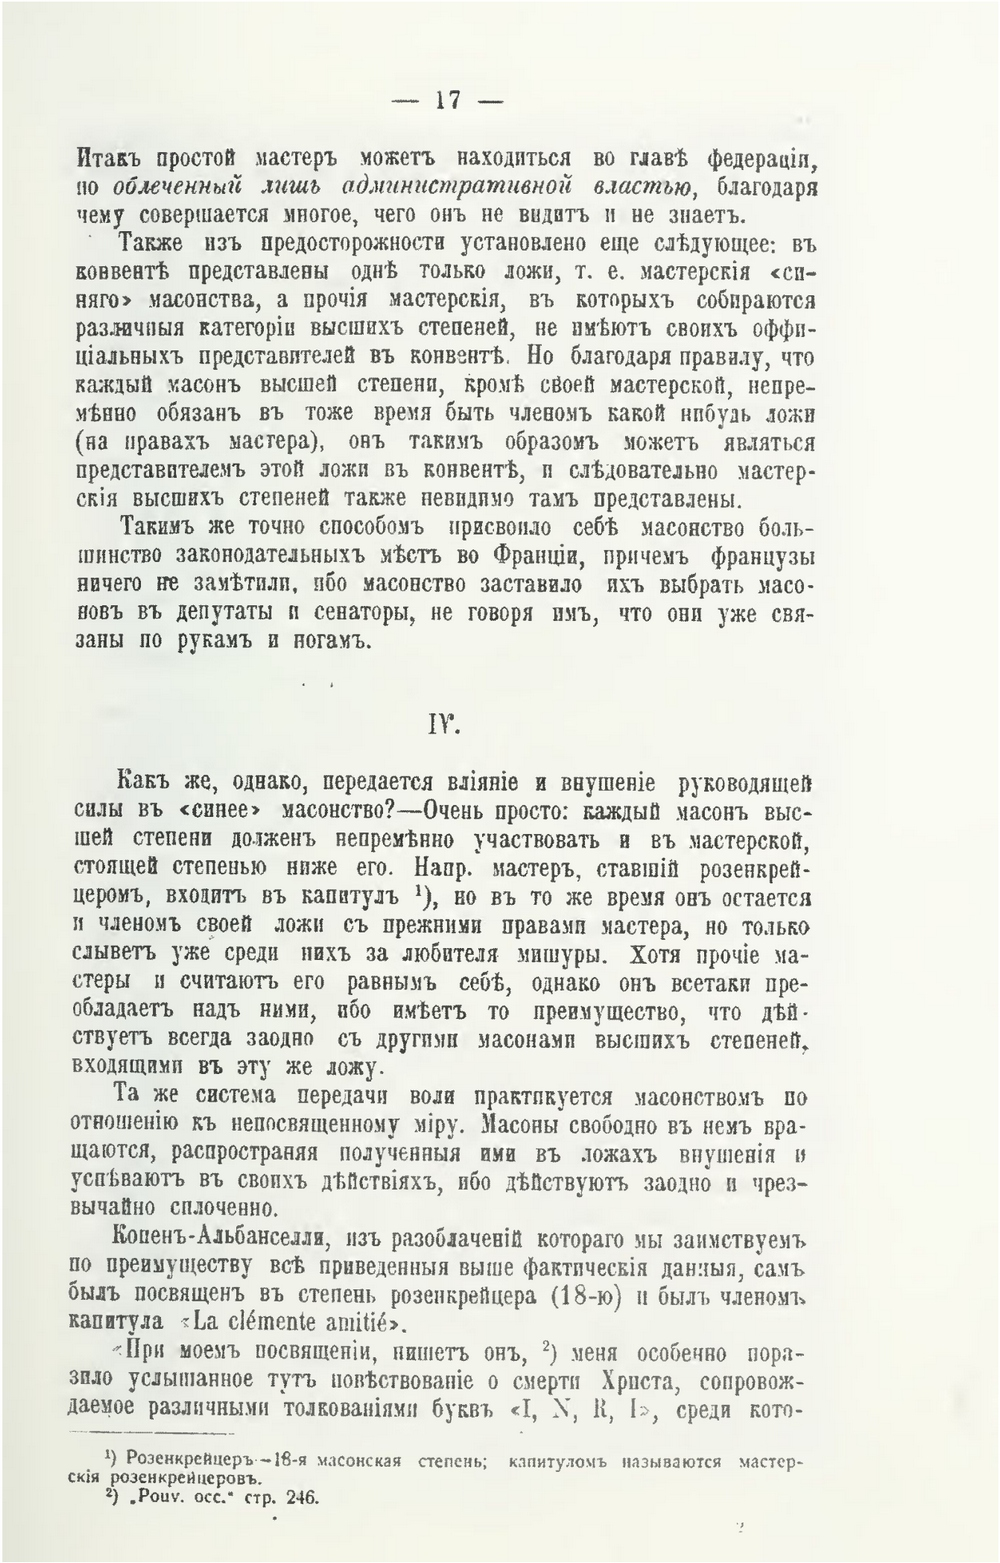 http://i1.imageban.ru/out/2014/01/14/97c6a98a53e7689211c5687ad82ff469.jpg